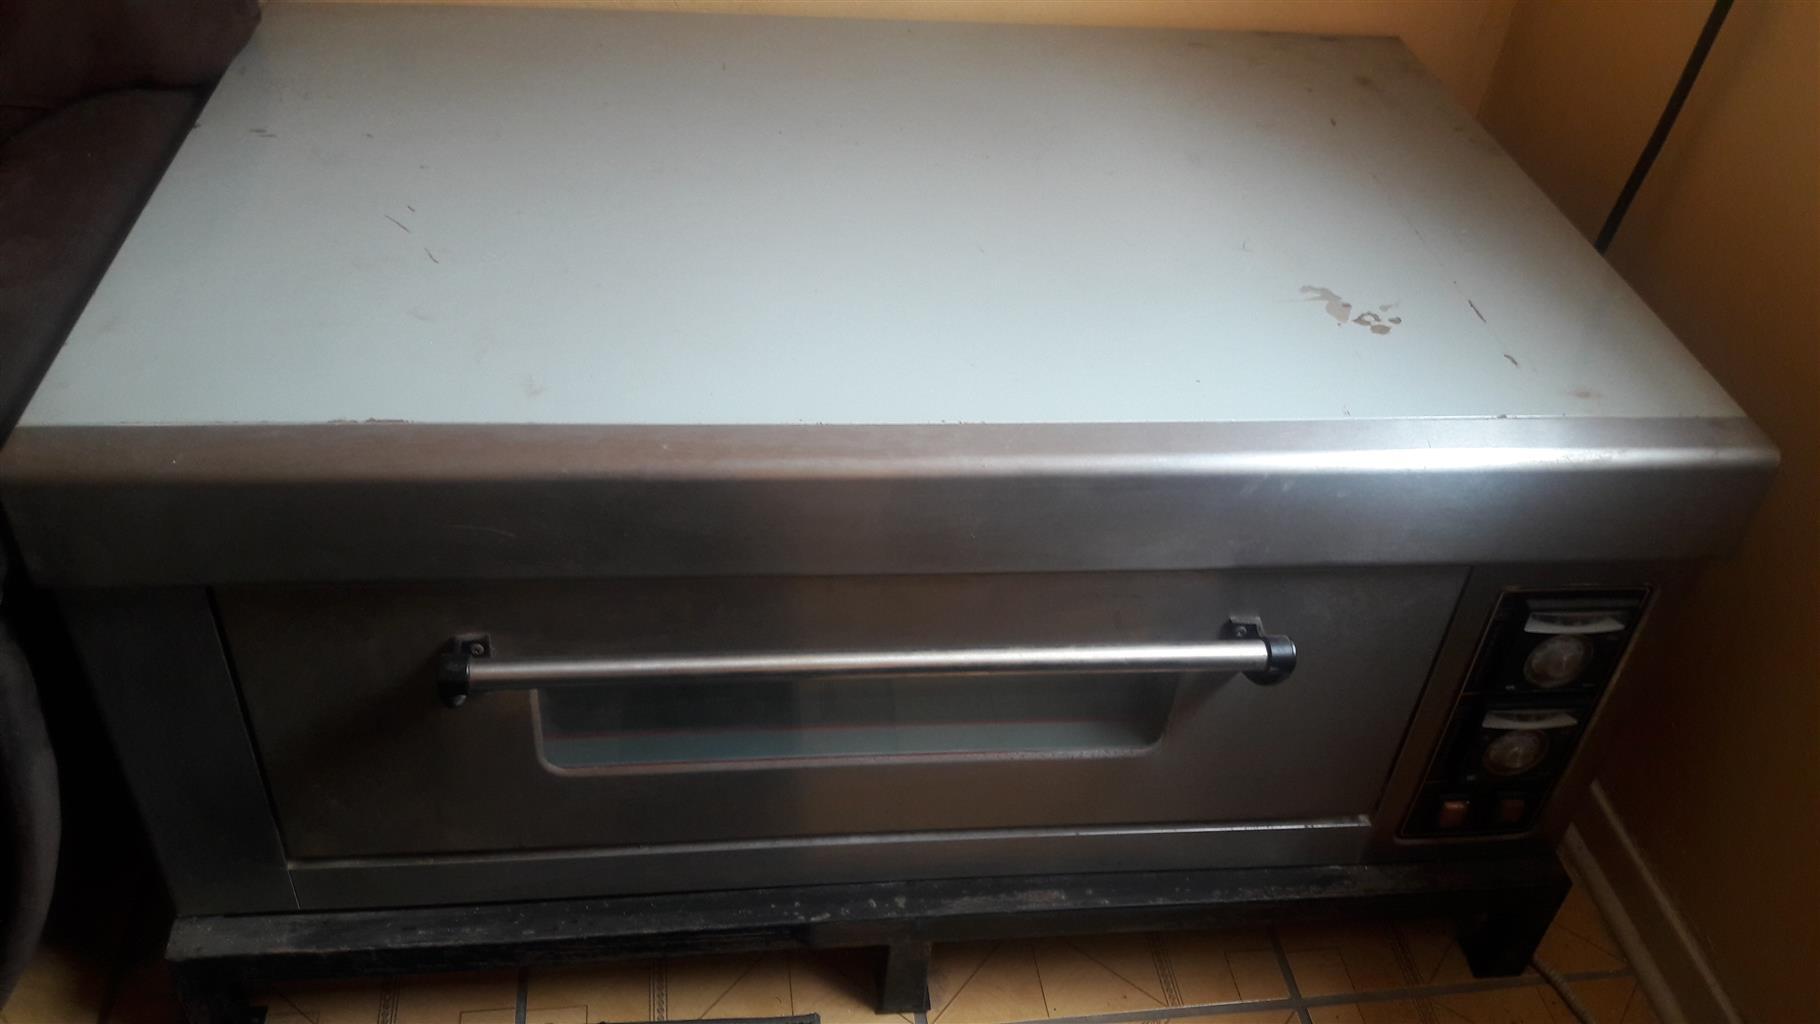 Bakery Oven